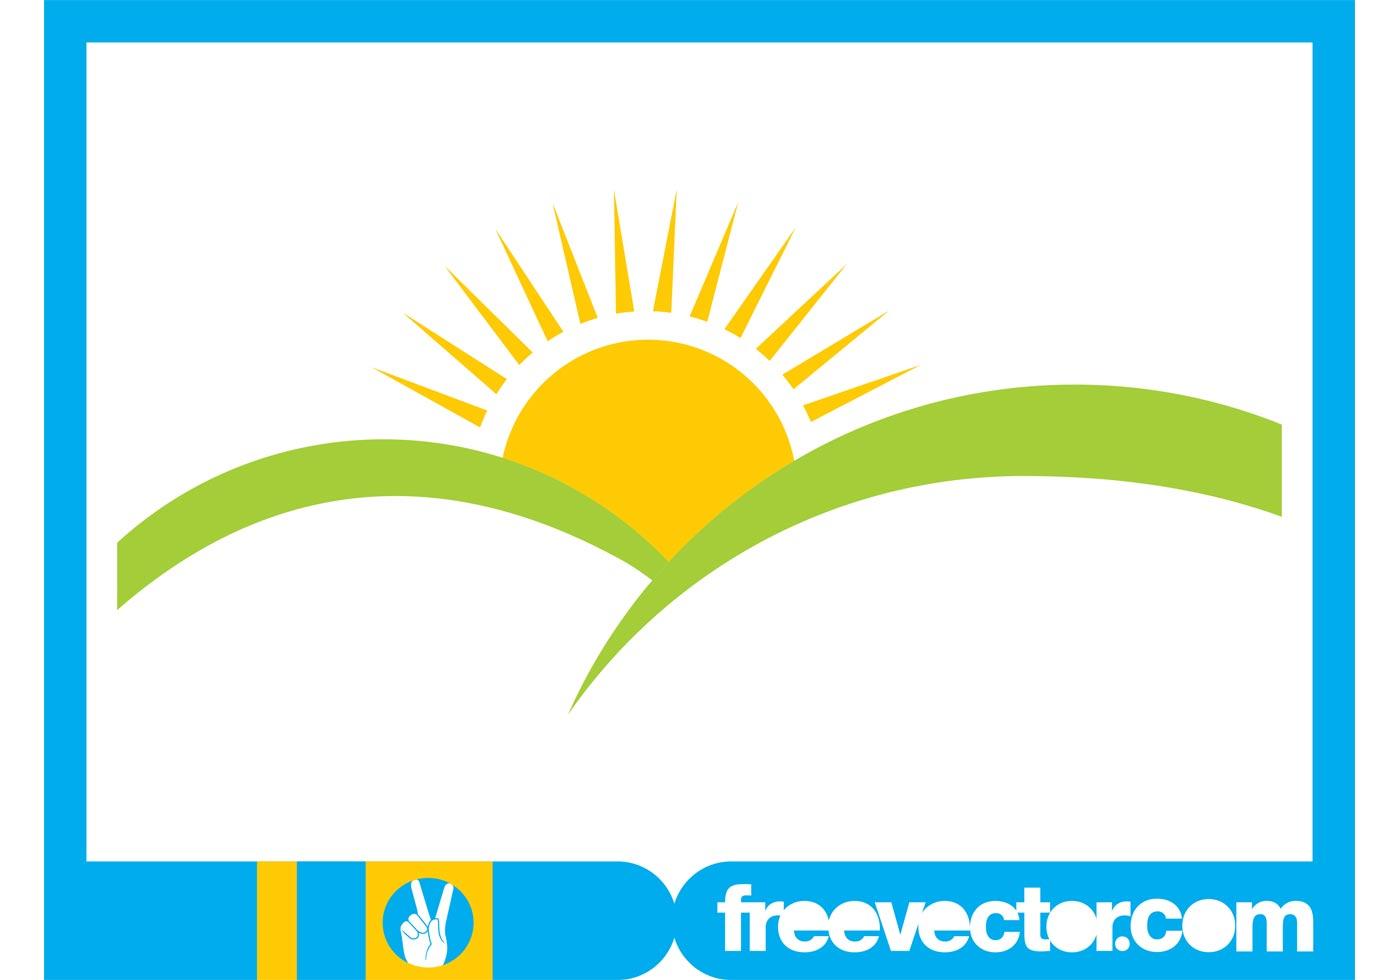 Sunrise Logo Designs  114 Logos to Browse